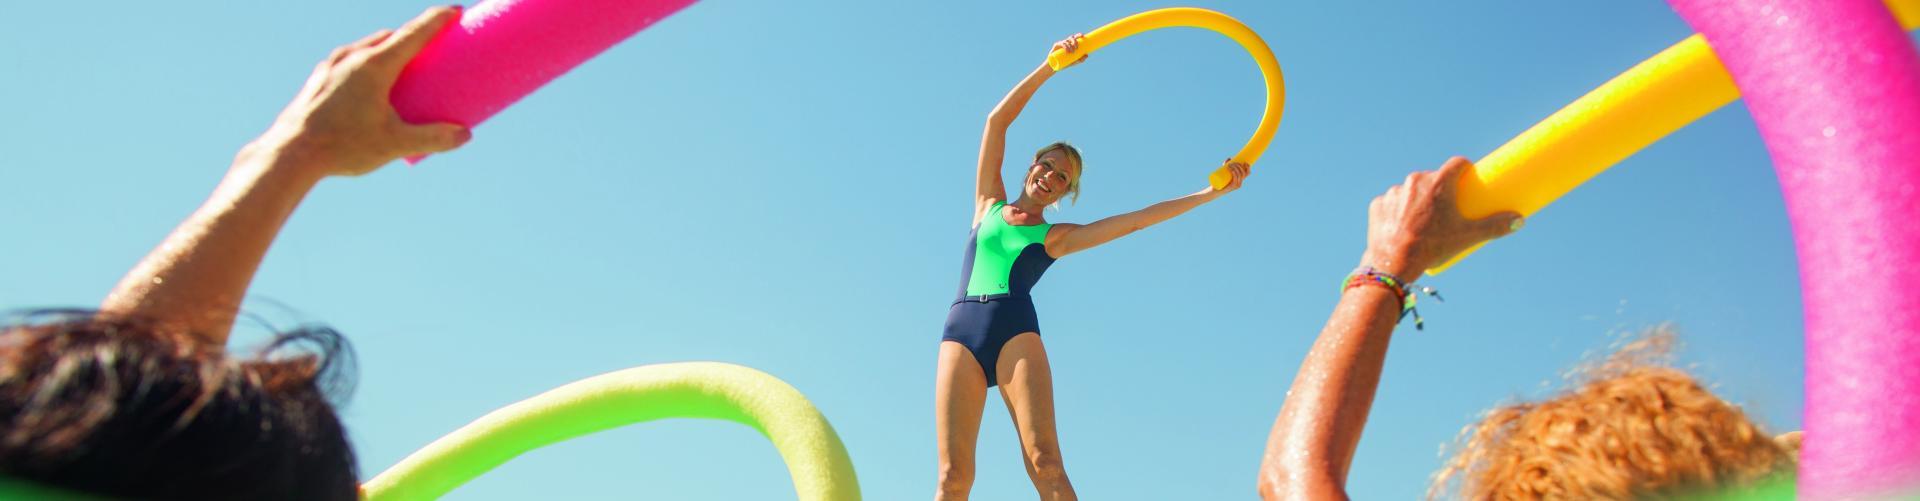 Sporturlaub am Meer